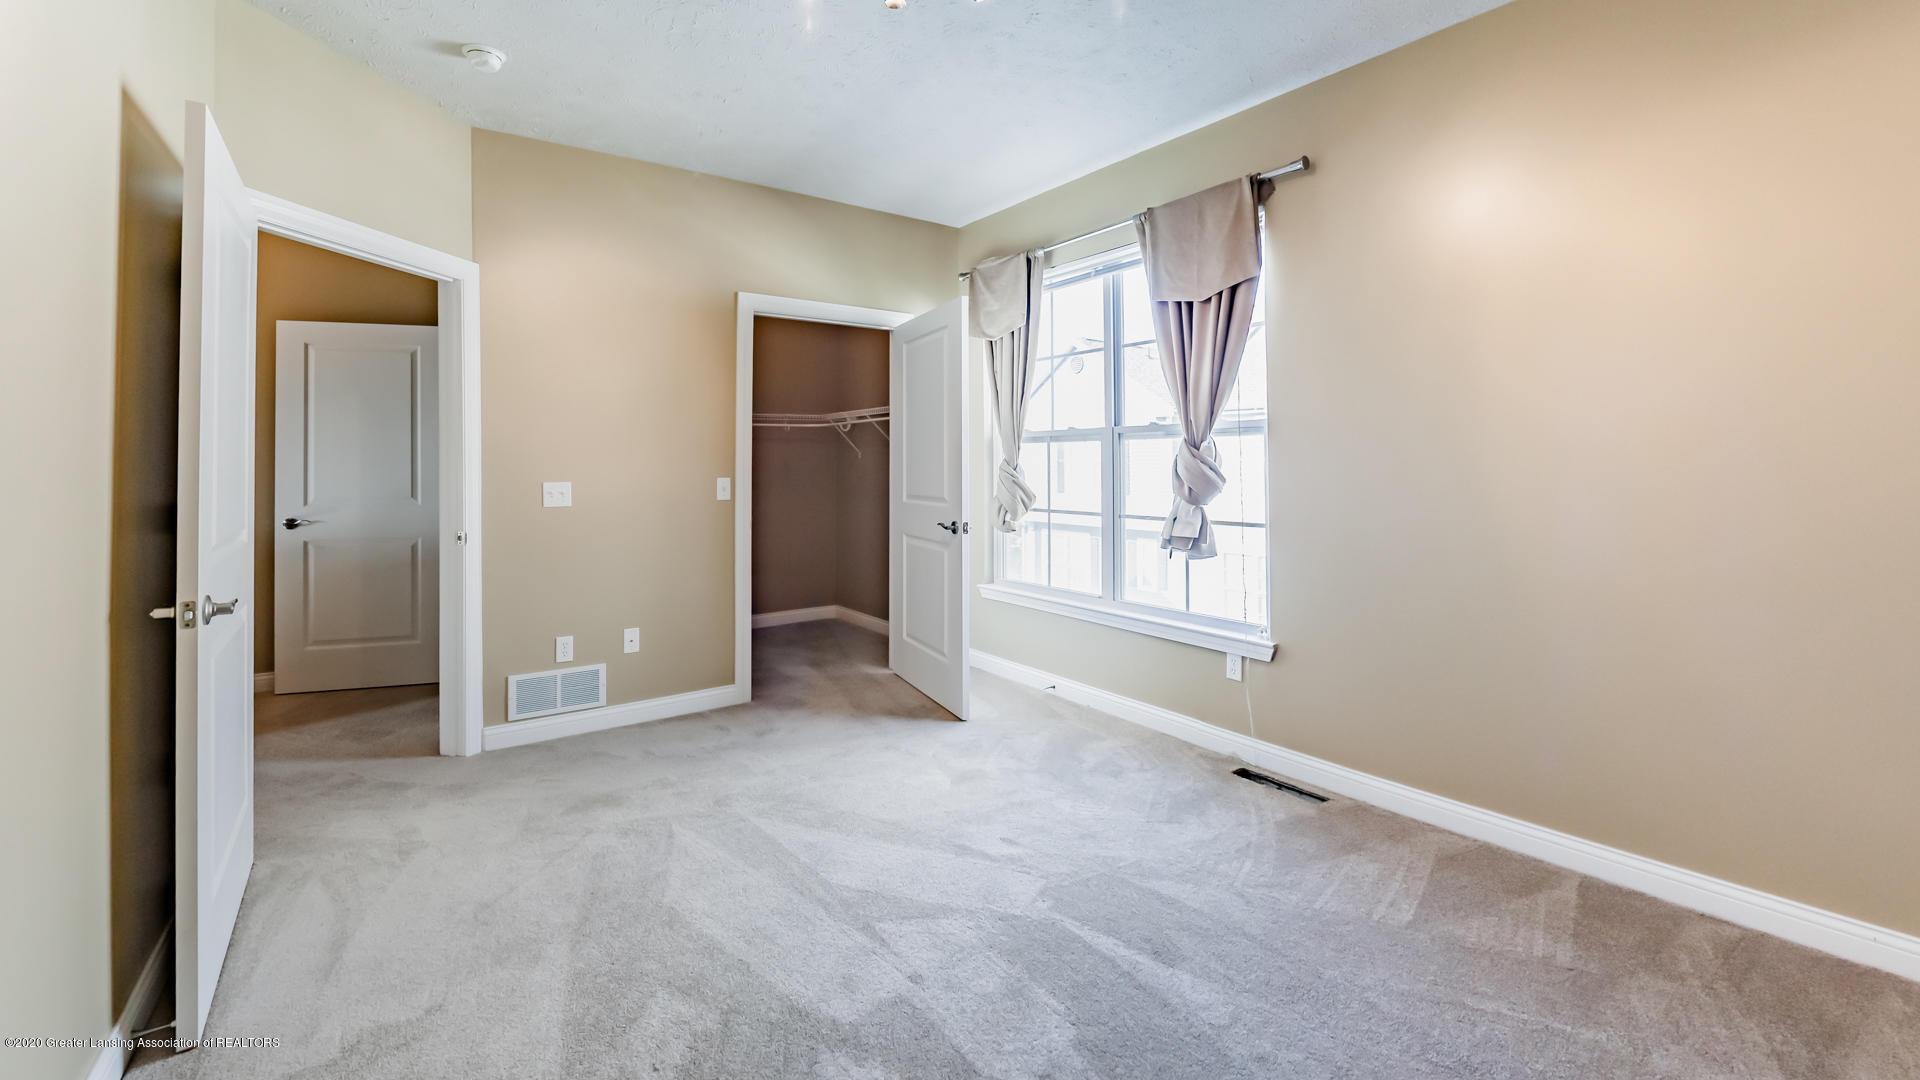 3307 Wharton St - Bedroom - 16